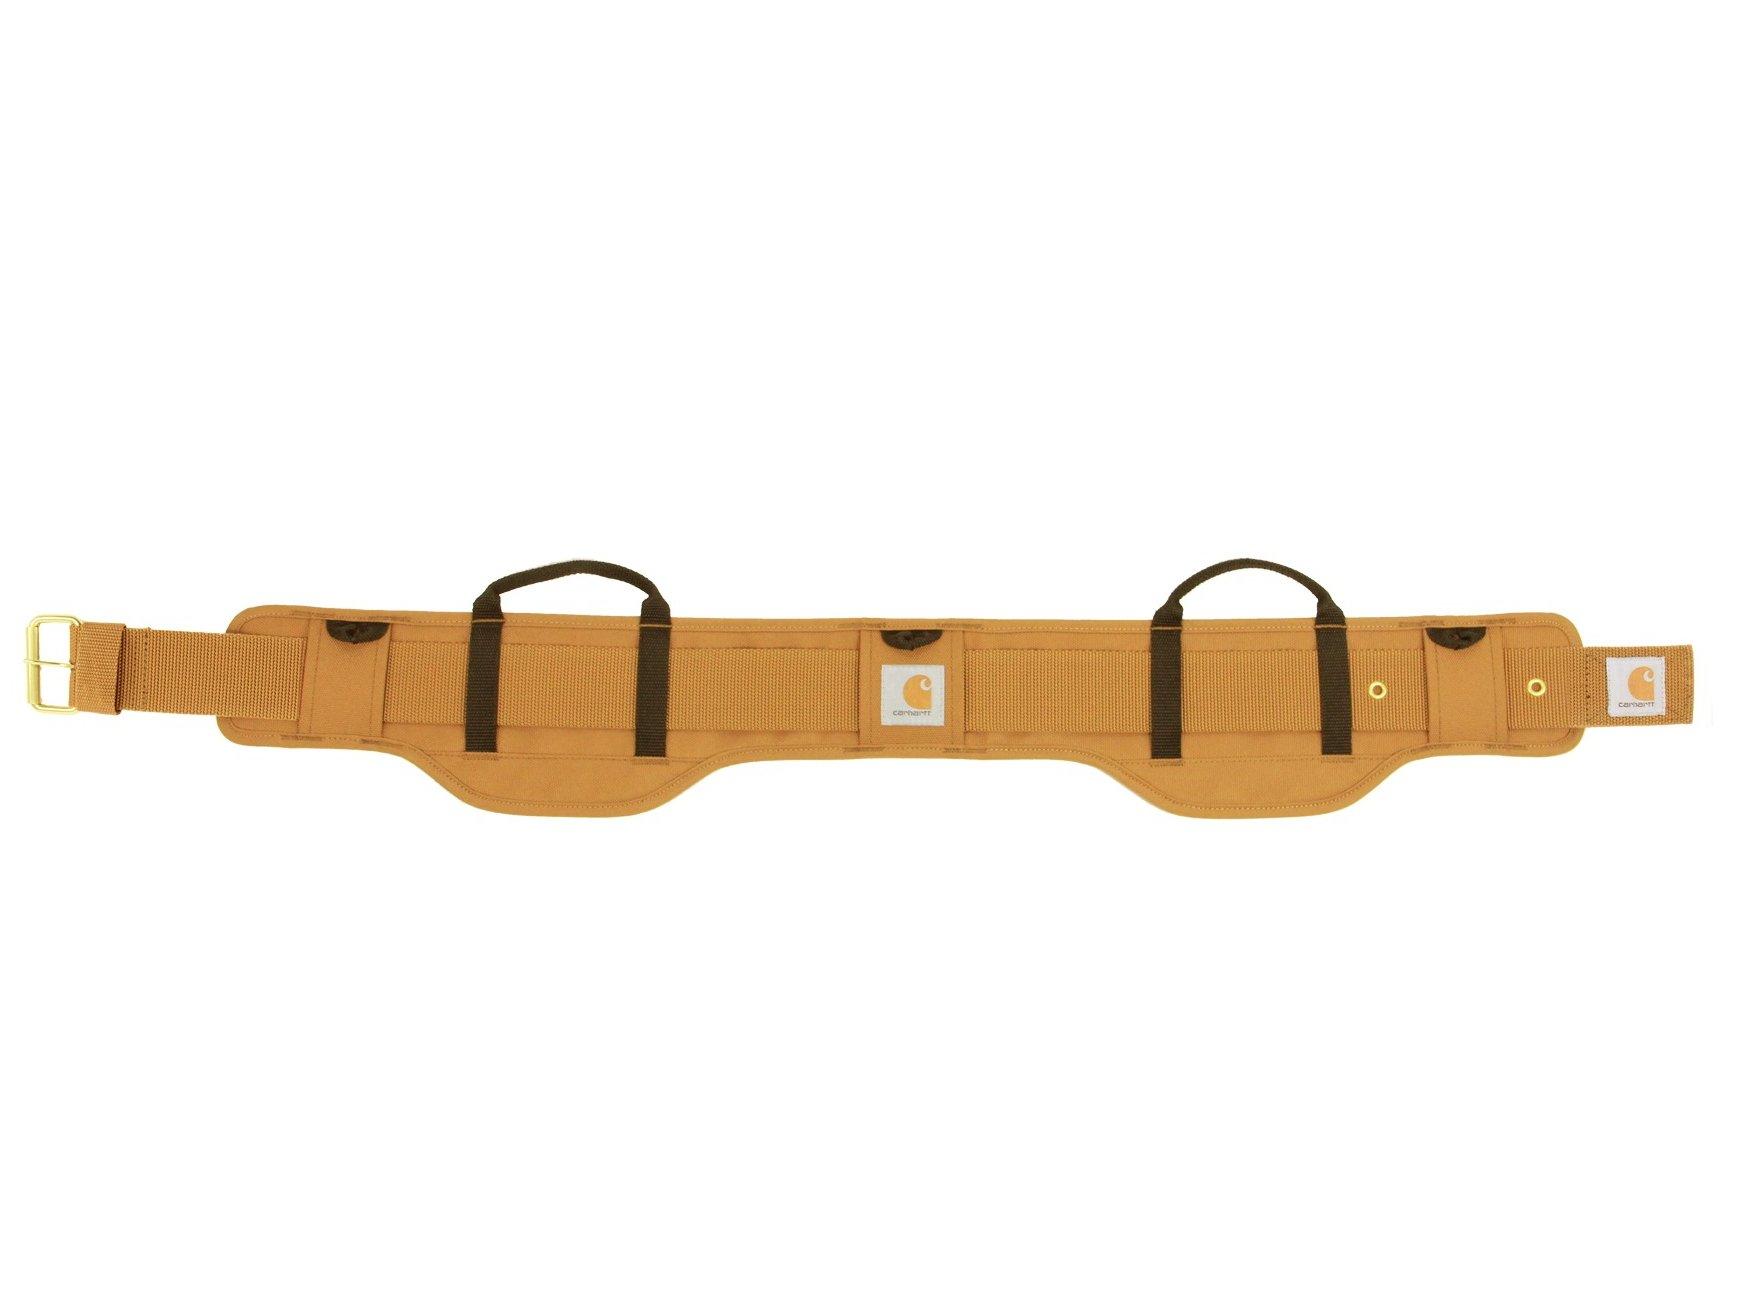 Carhartt Legacy Build Your Own Belt Custom Tool Belt, Padded